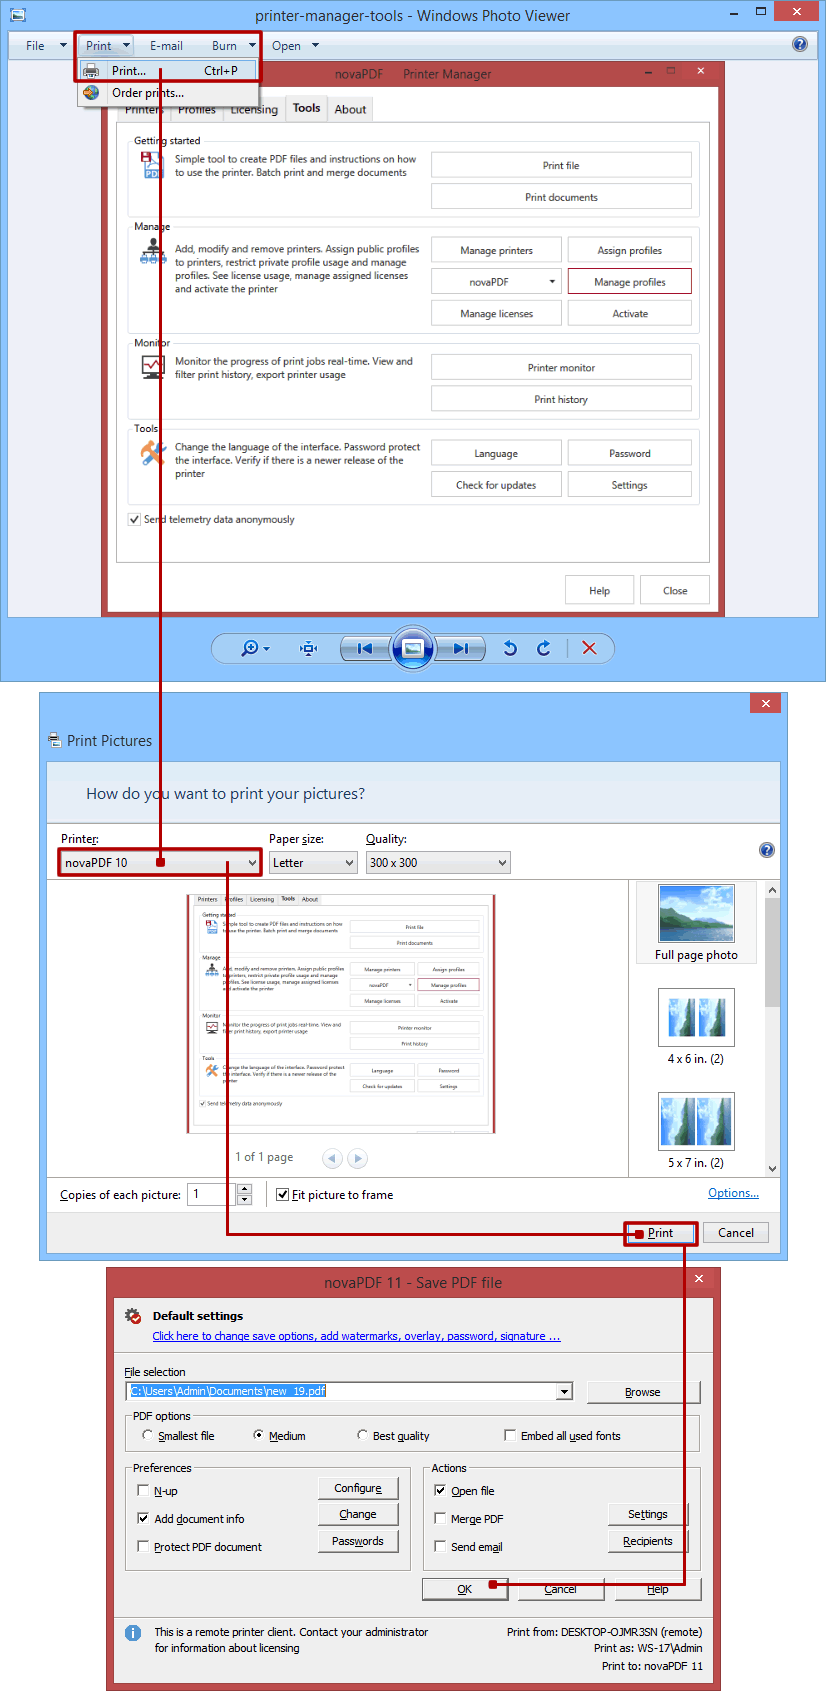 Convert JPG to PDF (or other image formats to PDF) - novaPDF